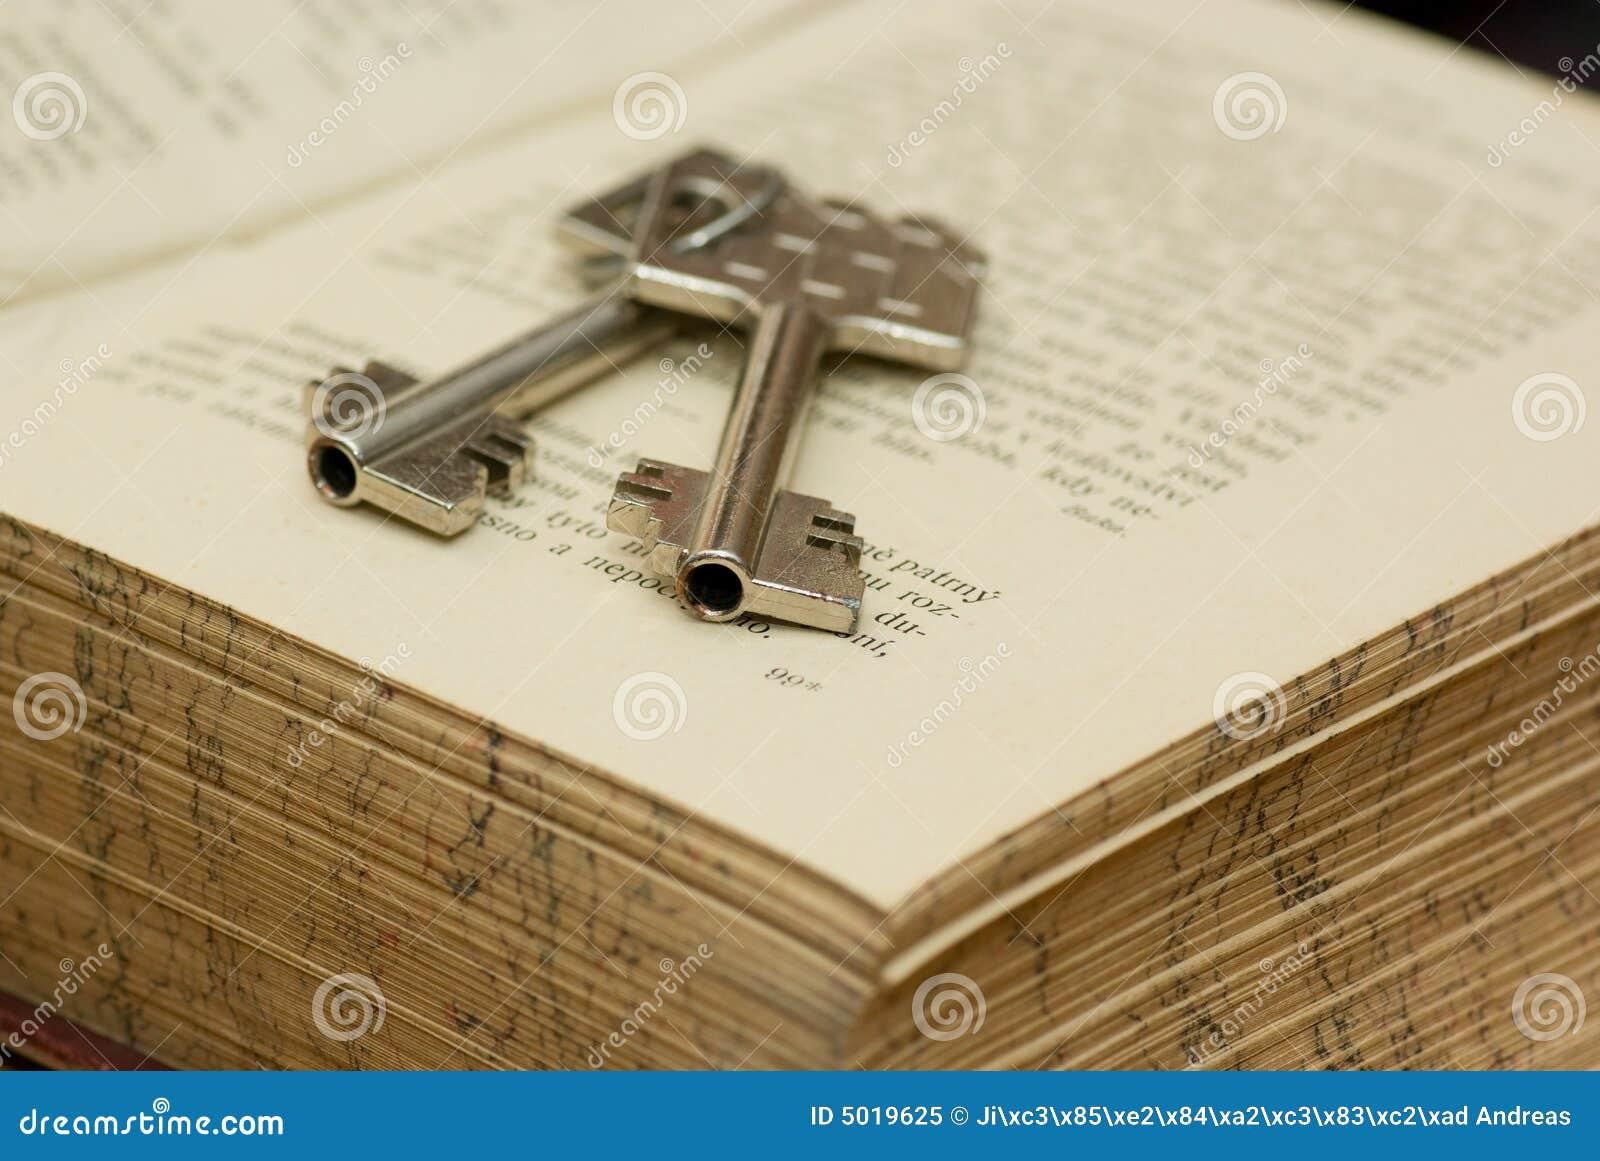 key-safe-deposit-box-5019625.jpg